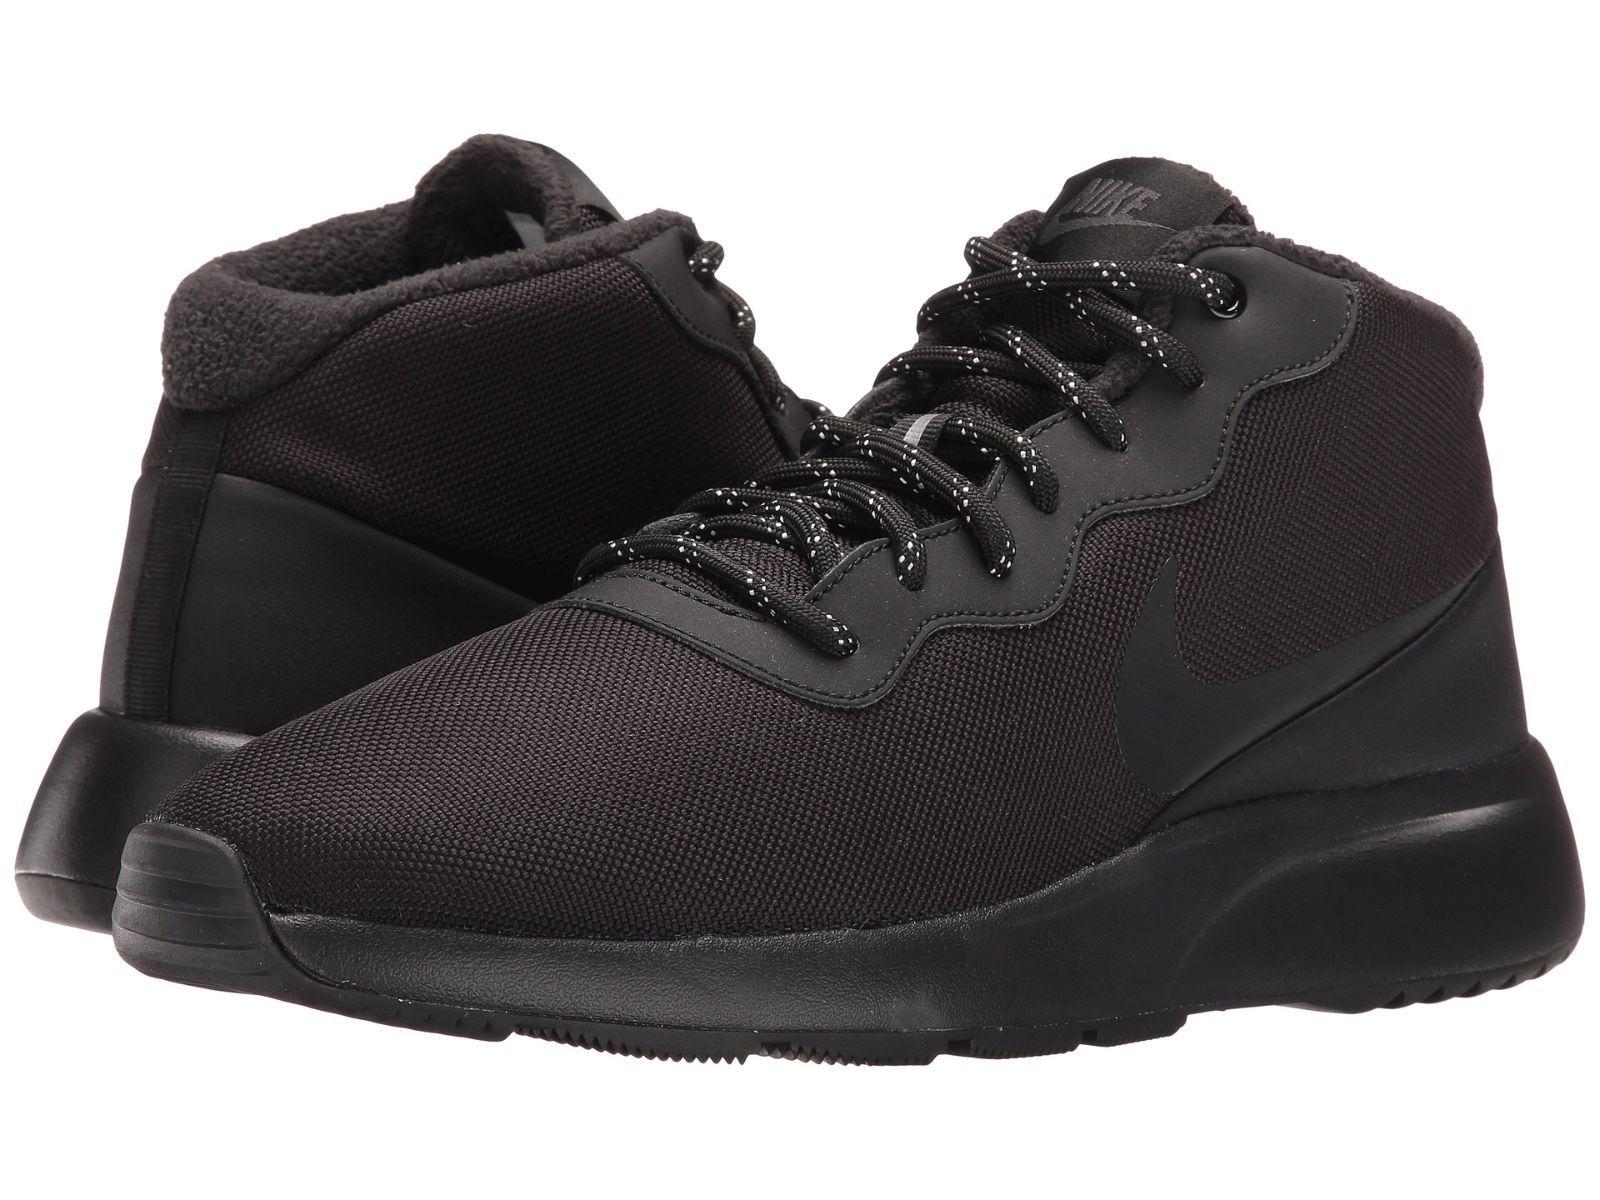 Nike Men's Shoes Tanjun Chukka Black Running Sneakers ...